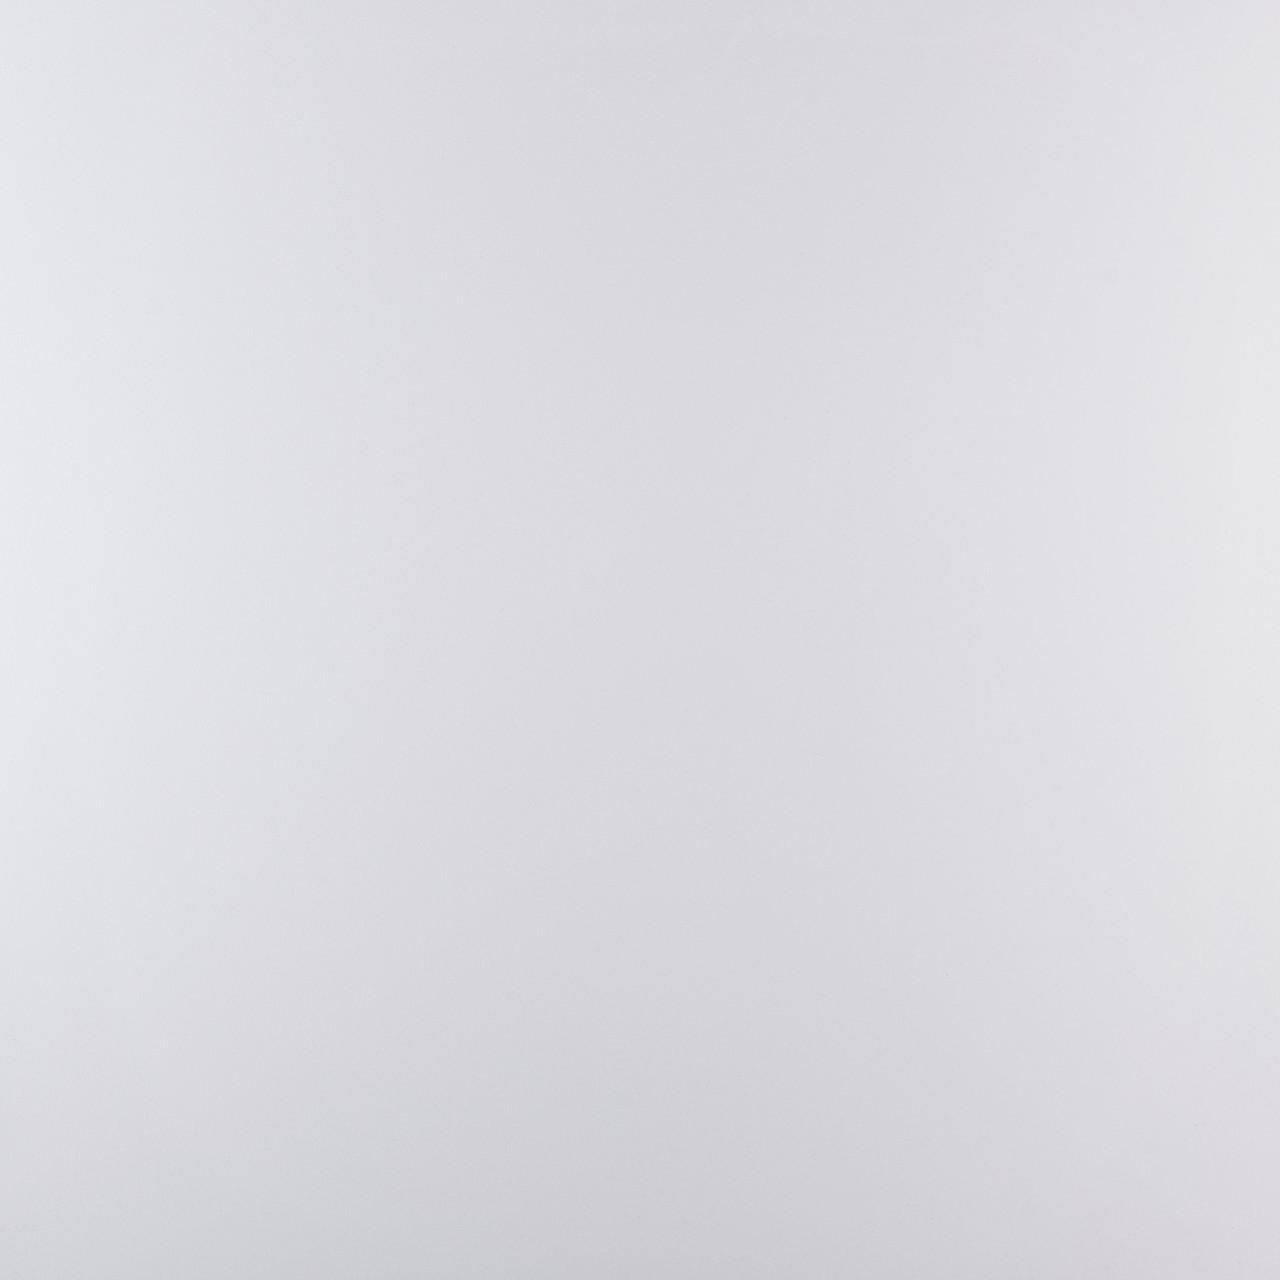 Плитка,  керамогранит супер белый,   600х600